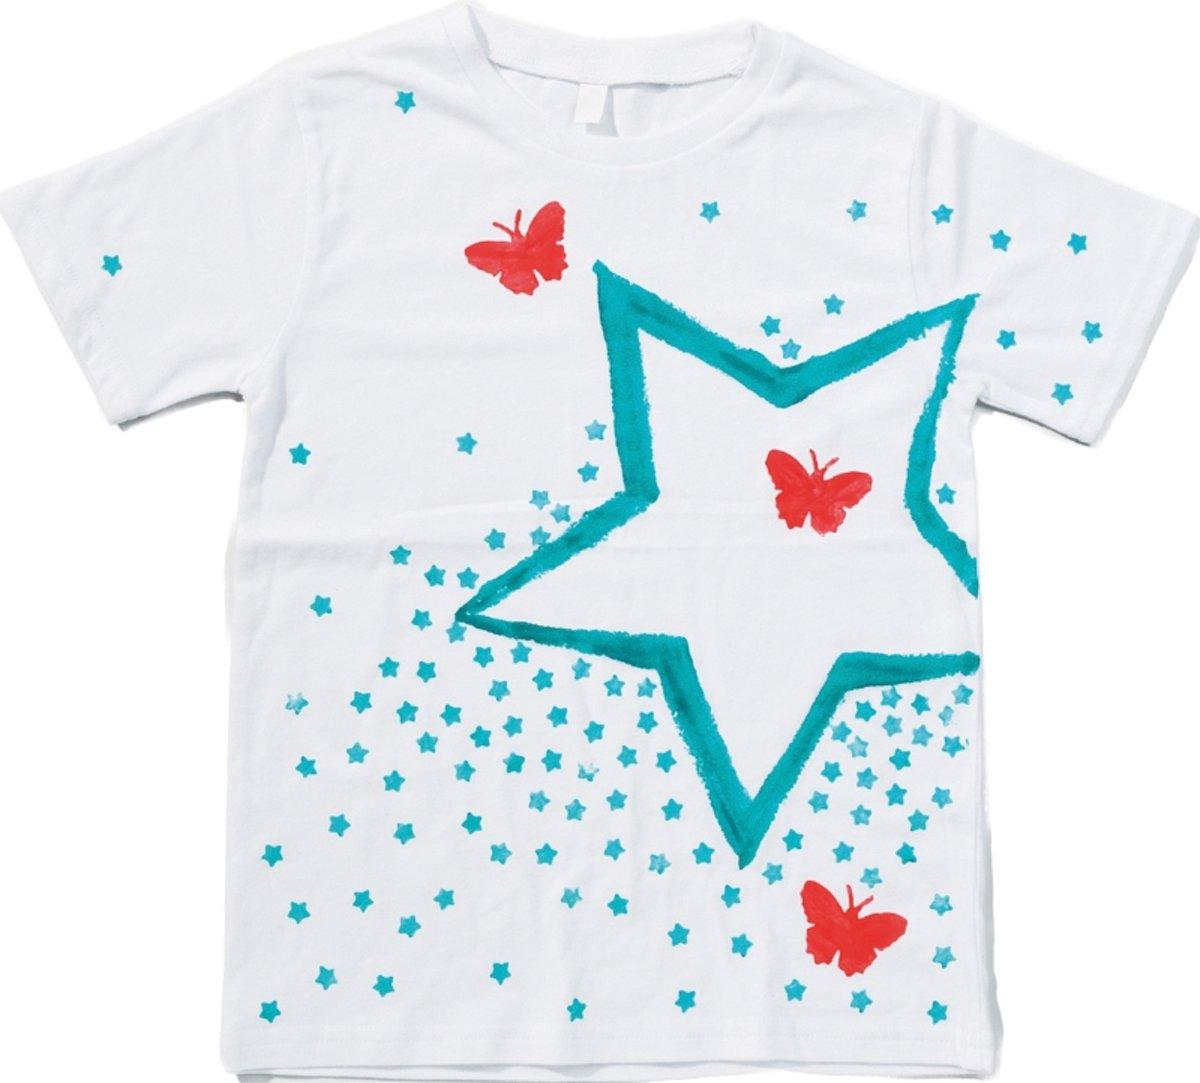 New bol.com   SES Textielverf met t-shirt, SES   Speelgoed @BO59